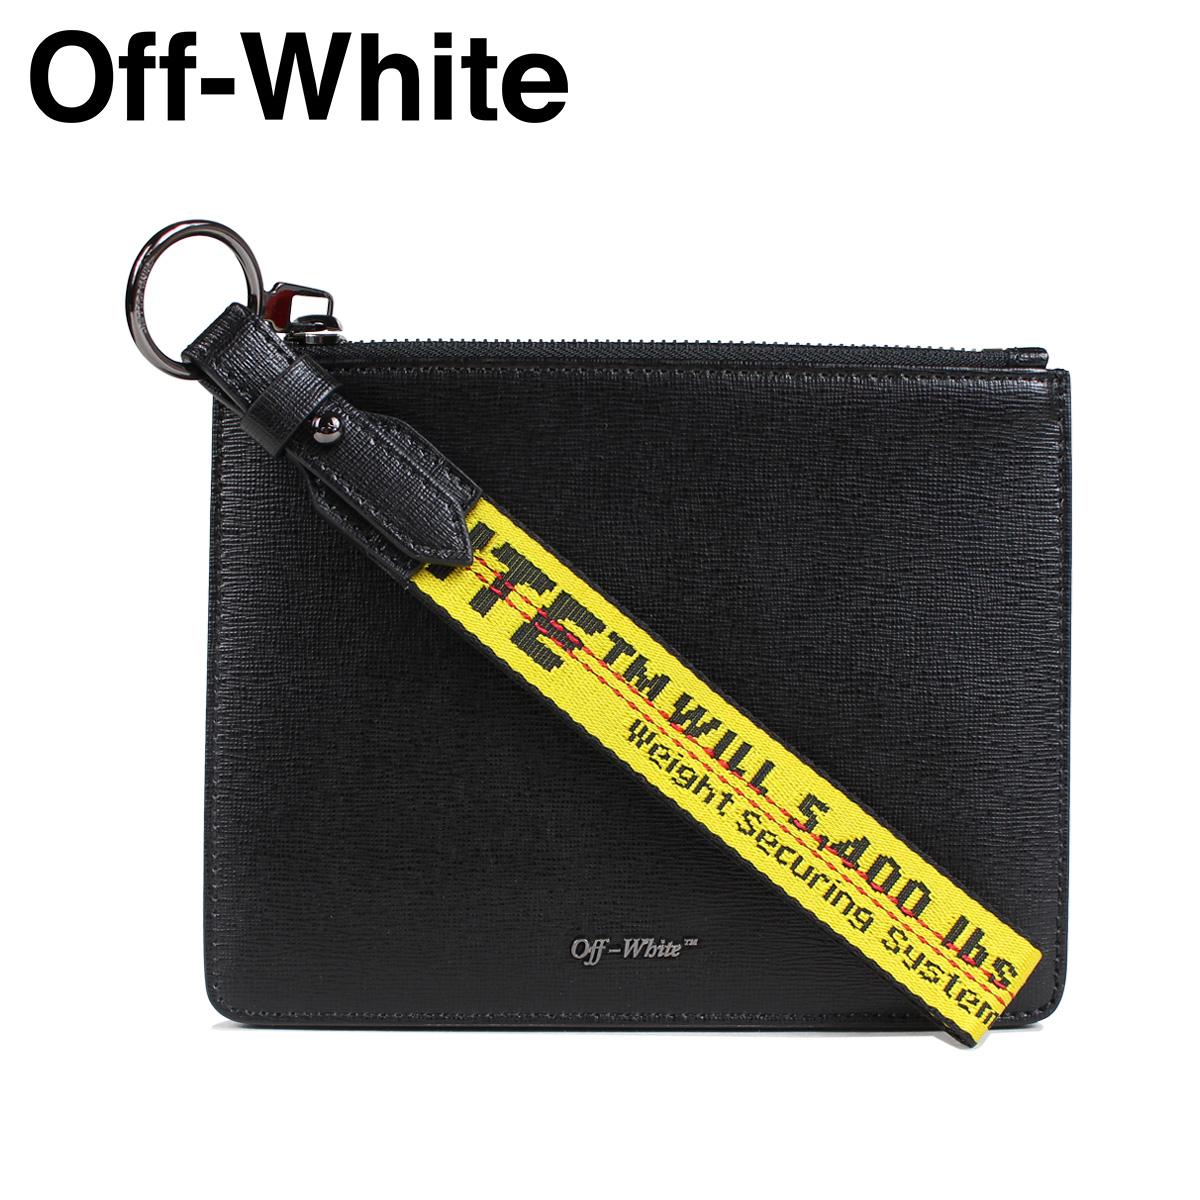 Off-white DOUBLE FLAT POUCH オフホワイト 小銭入れ コインケース ポーチ メンズ レディース ブラック OMNF001 647004